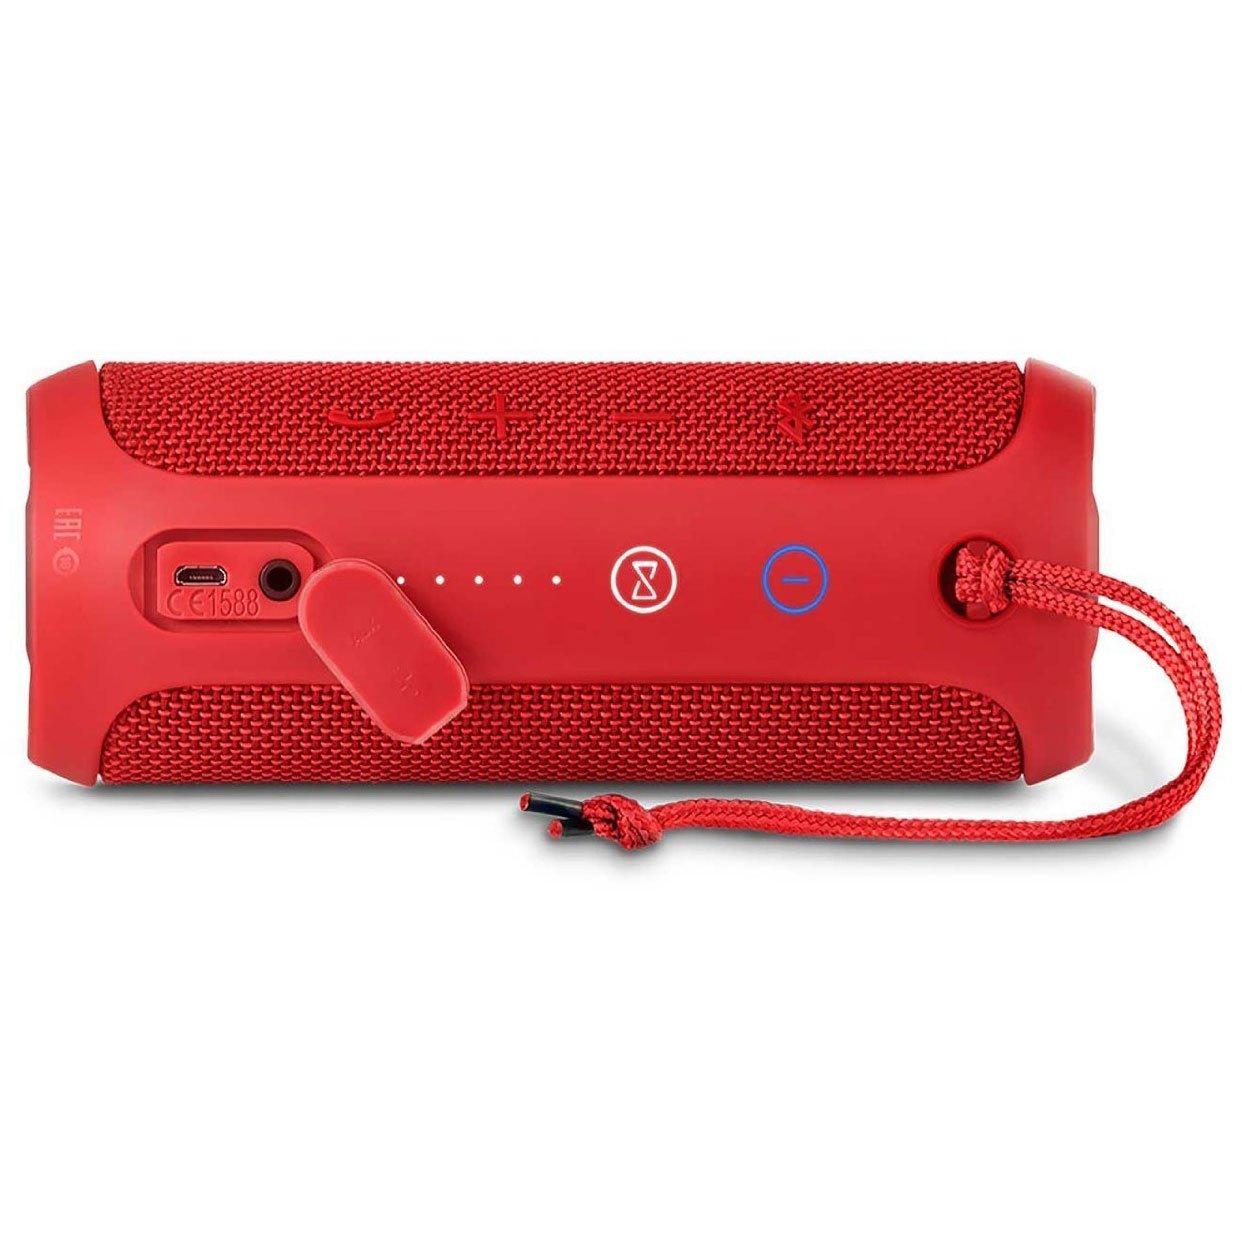 JBL Flip 3 Splashproof Portable Bluetooth Speaker, Black